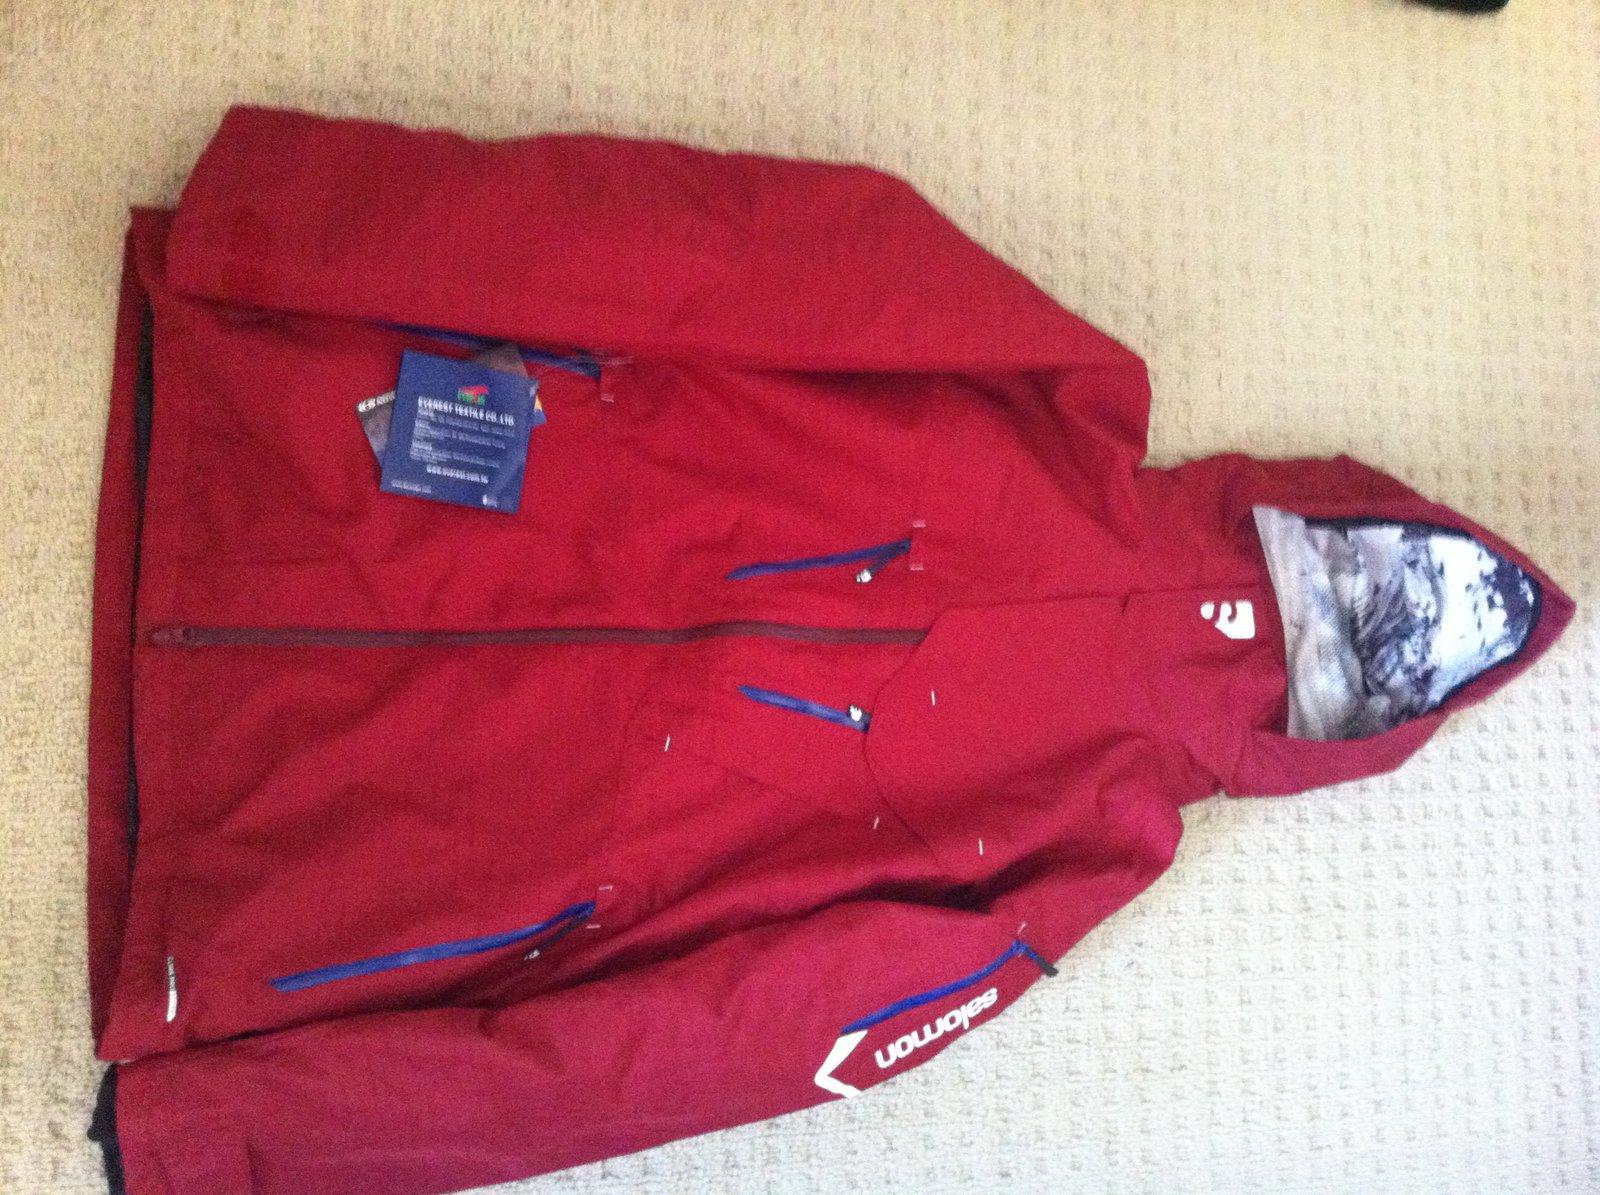 Salomon Mark Abma Jacket